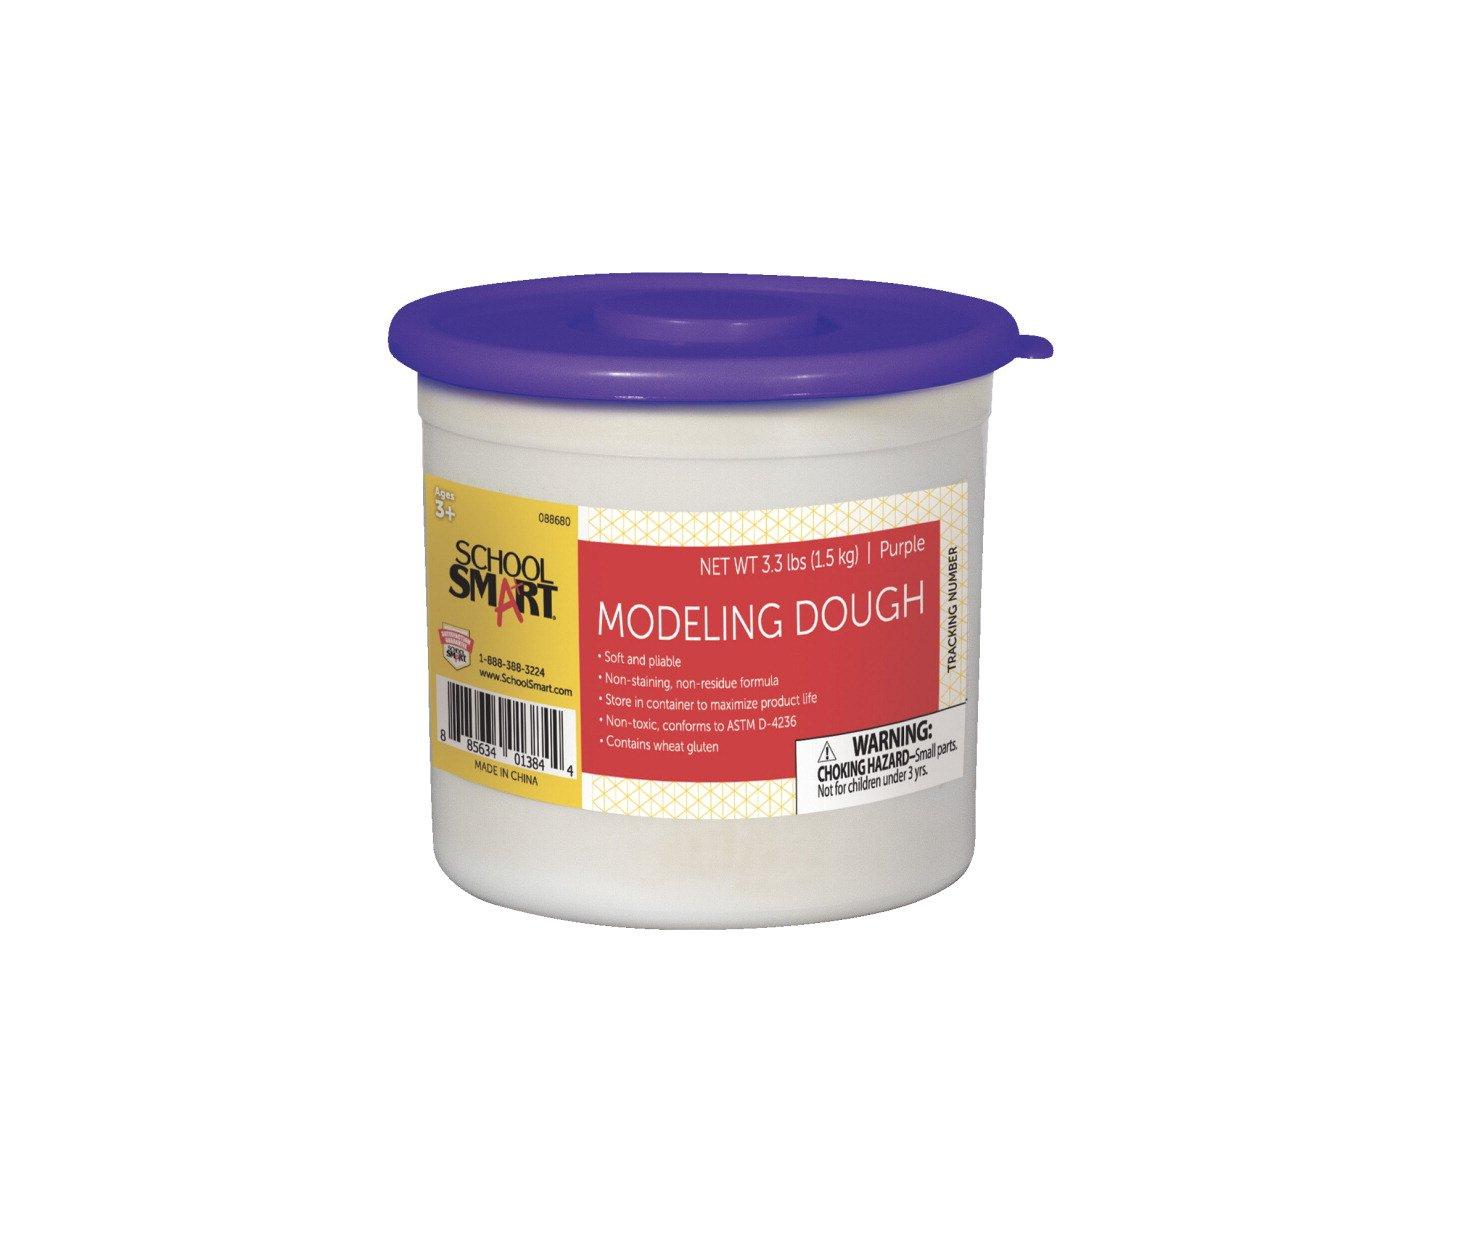 School Smart 88680 Non Toxic Modeling Dough - 3 1/3 pounds - Purple